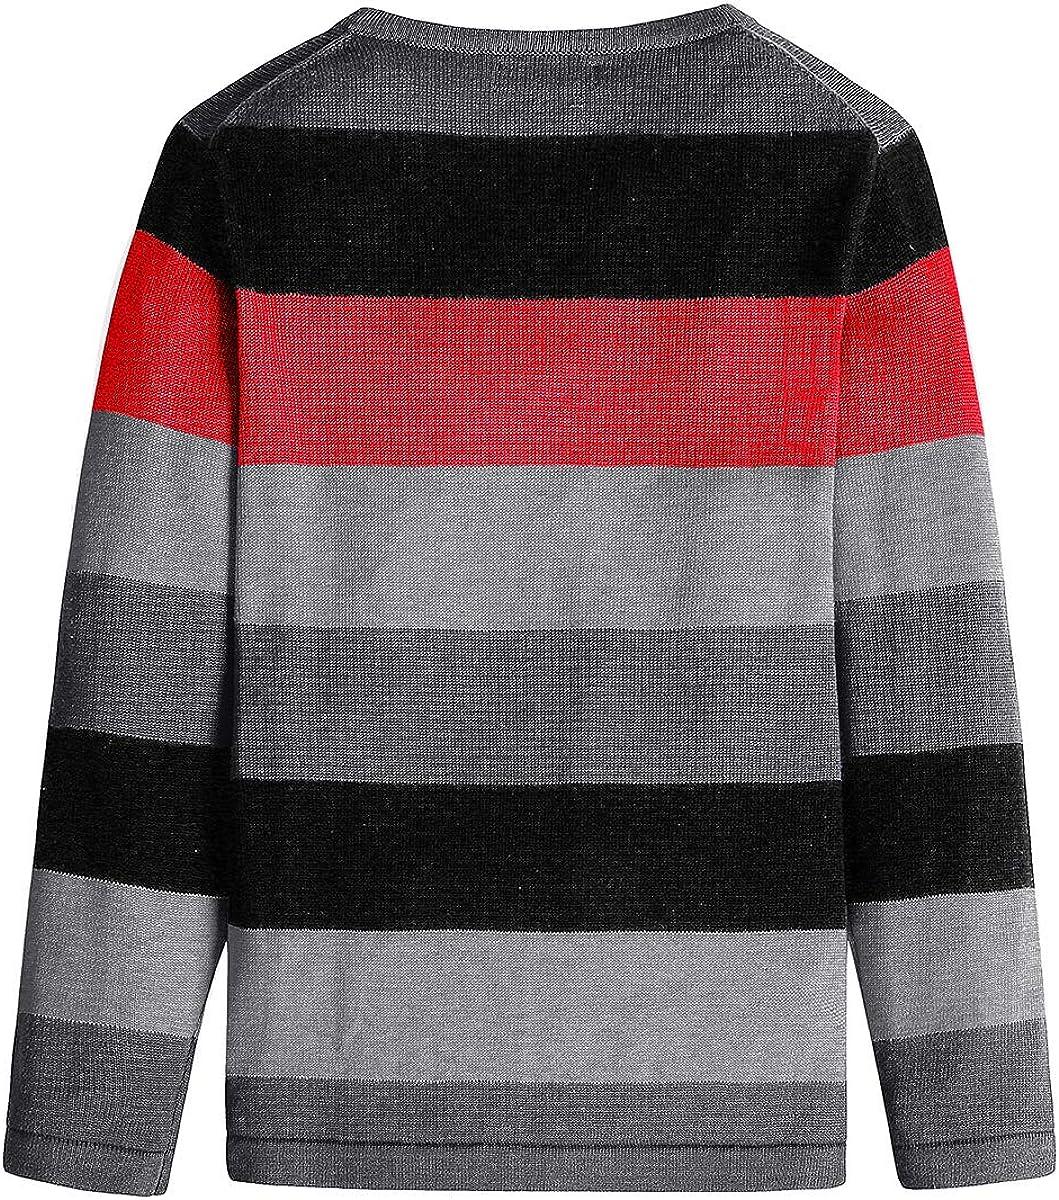 BASADINA Boys Long Sleeve Sweater Pullover 100/% Cotton Multicolor Stripe Sweaters